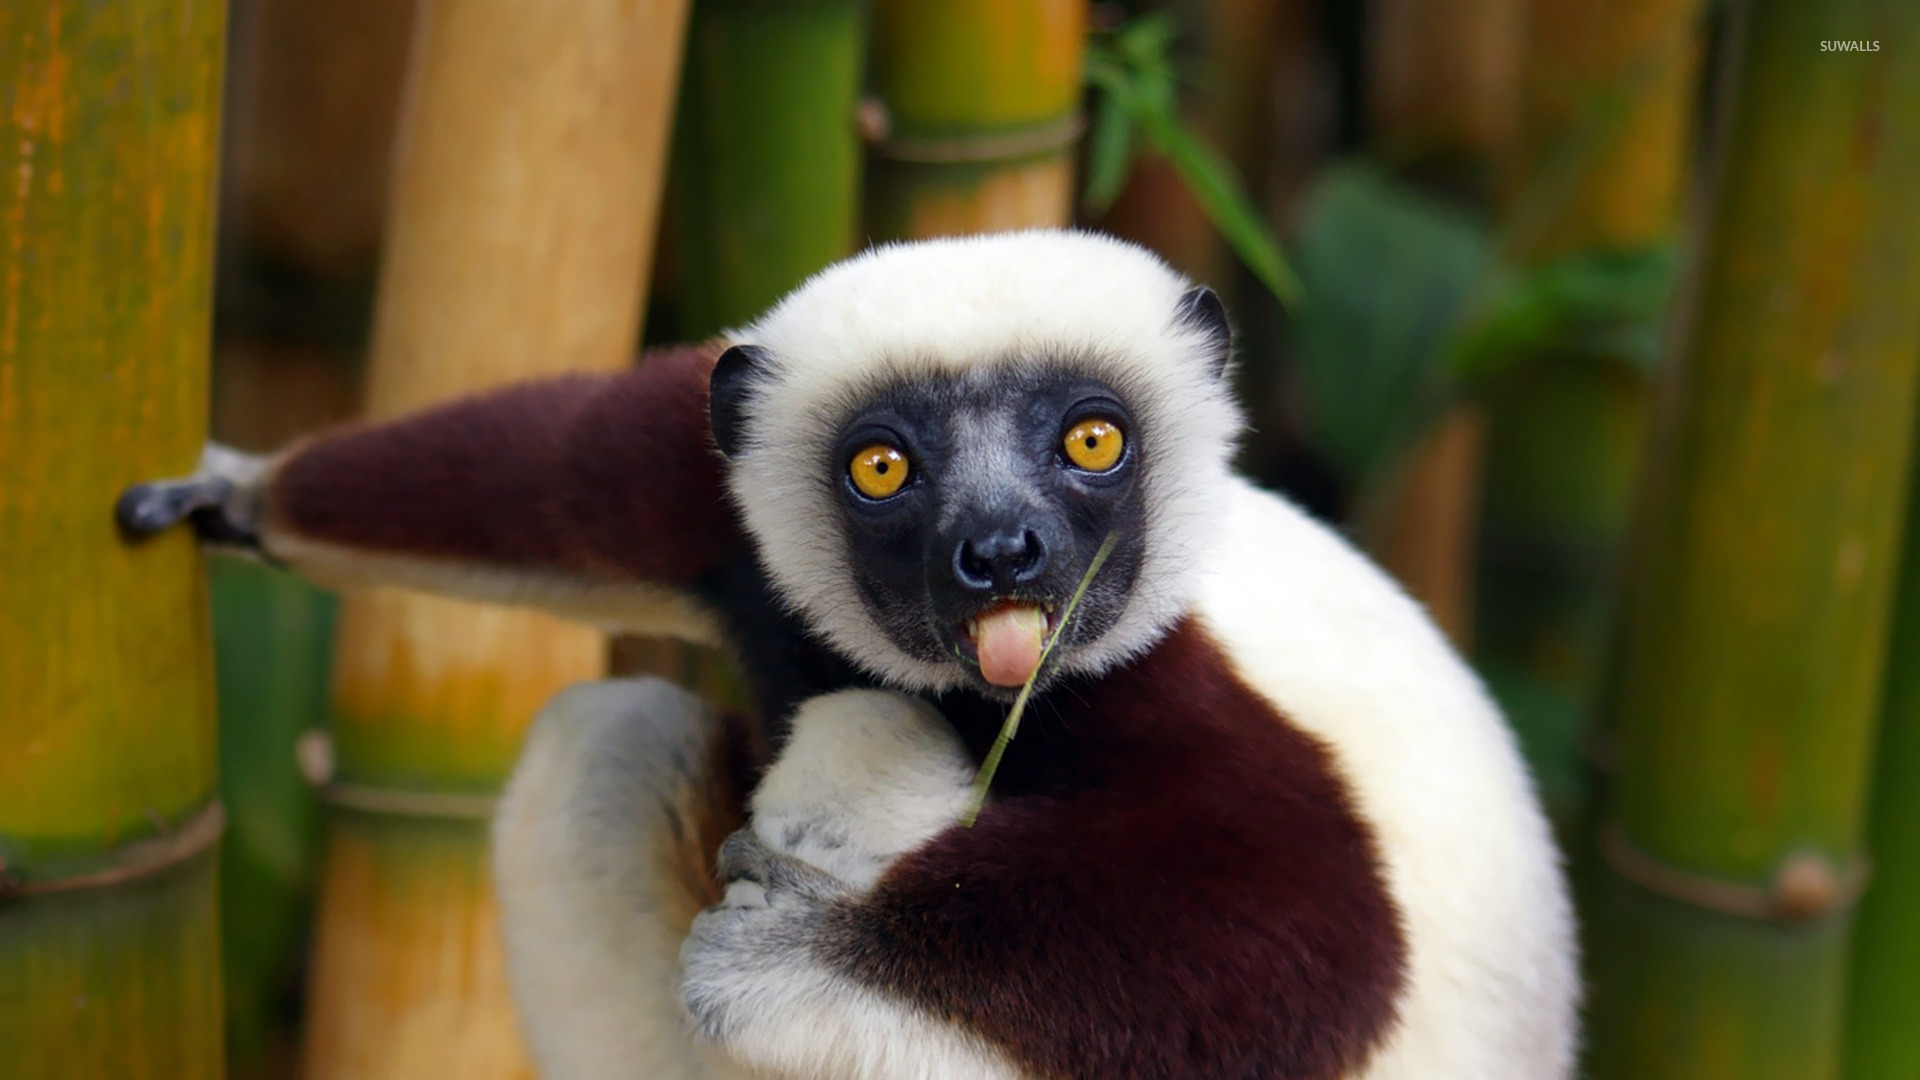 Top Lemur Wallpaper - lemur-15313-1920x1080  Trends_694039.jpg